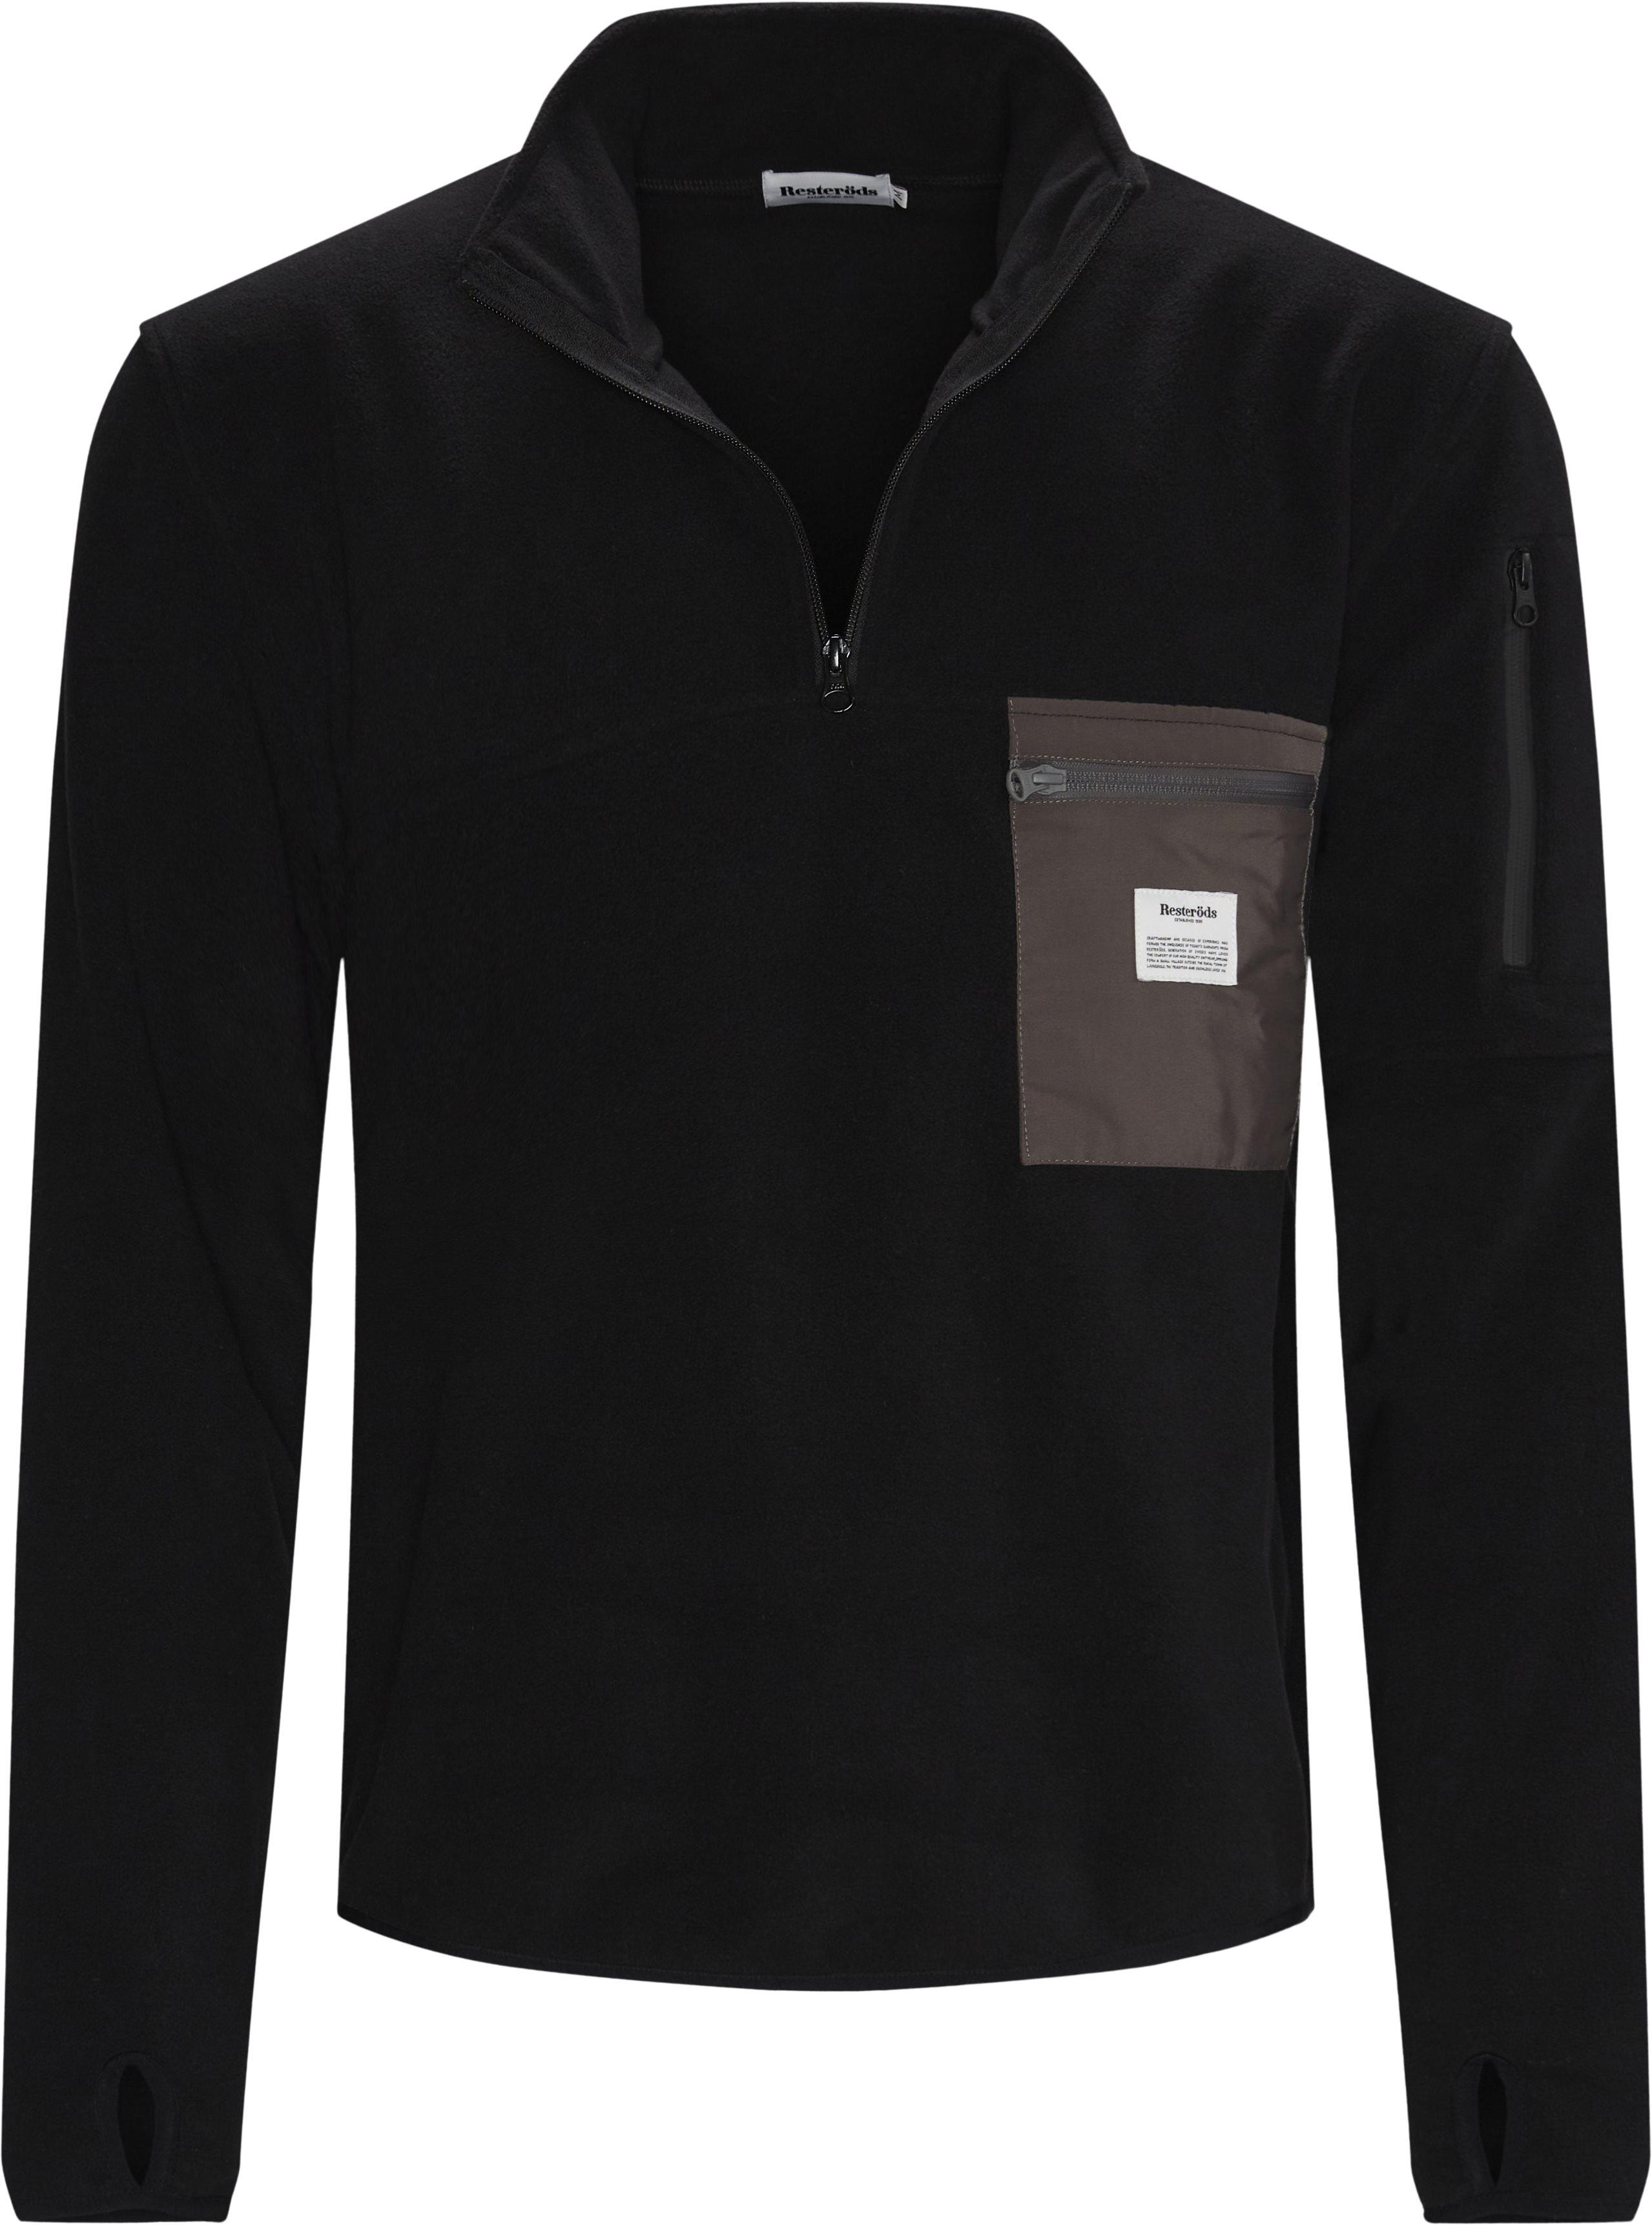 Pullover Fleece Anorak - Jackets - Regular - Black